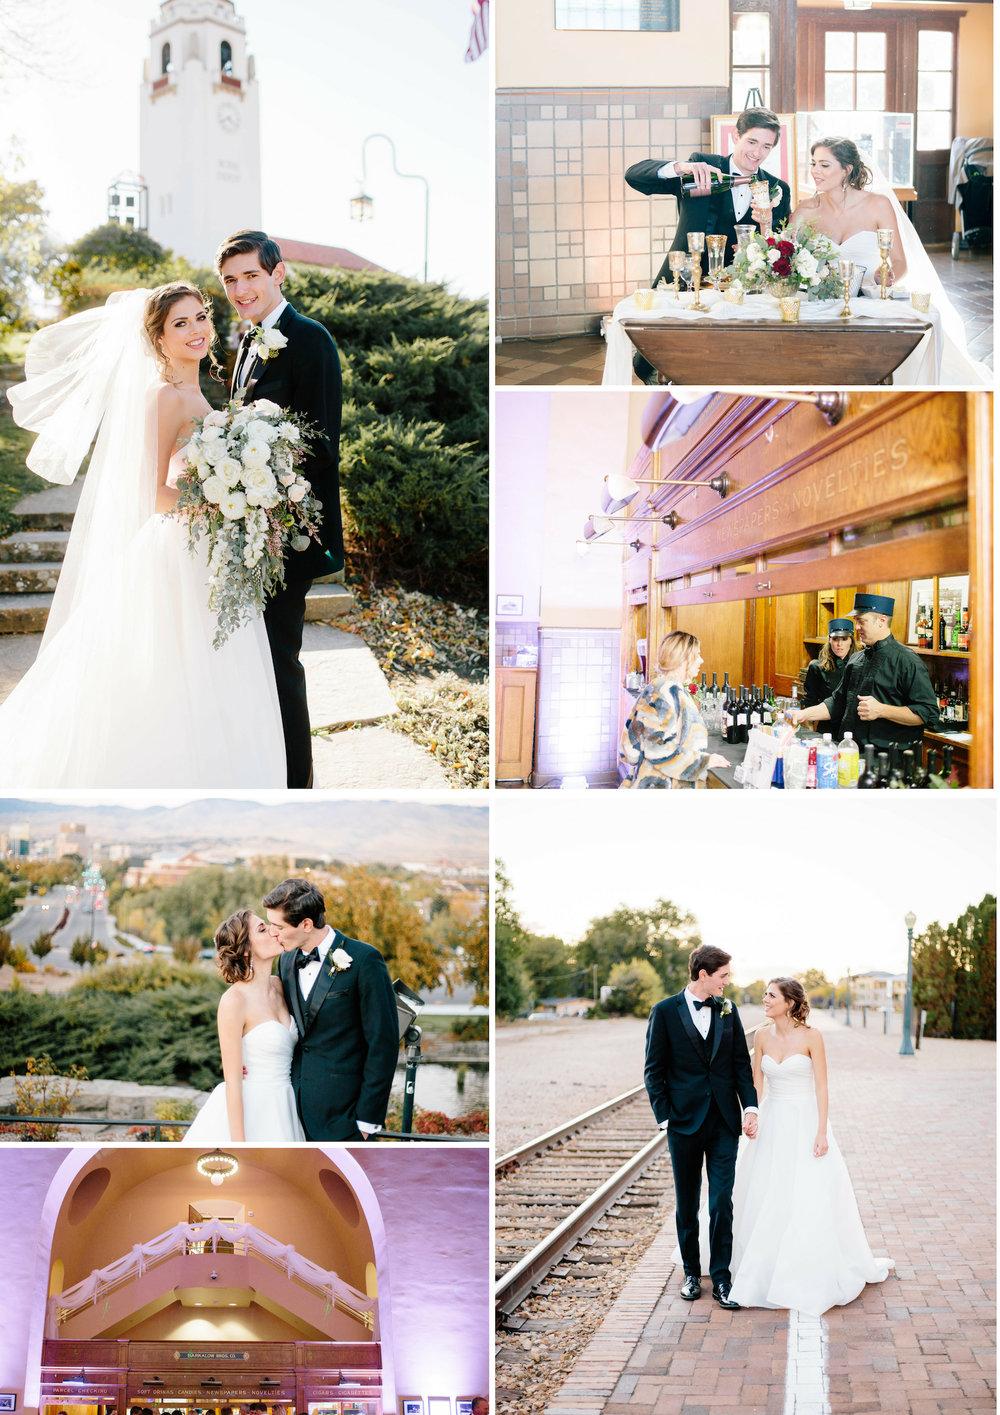 The Boise Depot Wedding- Boise Wedding Venues- Boise Wedding Photographer